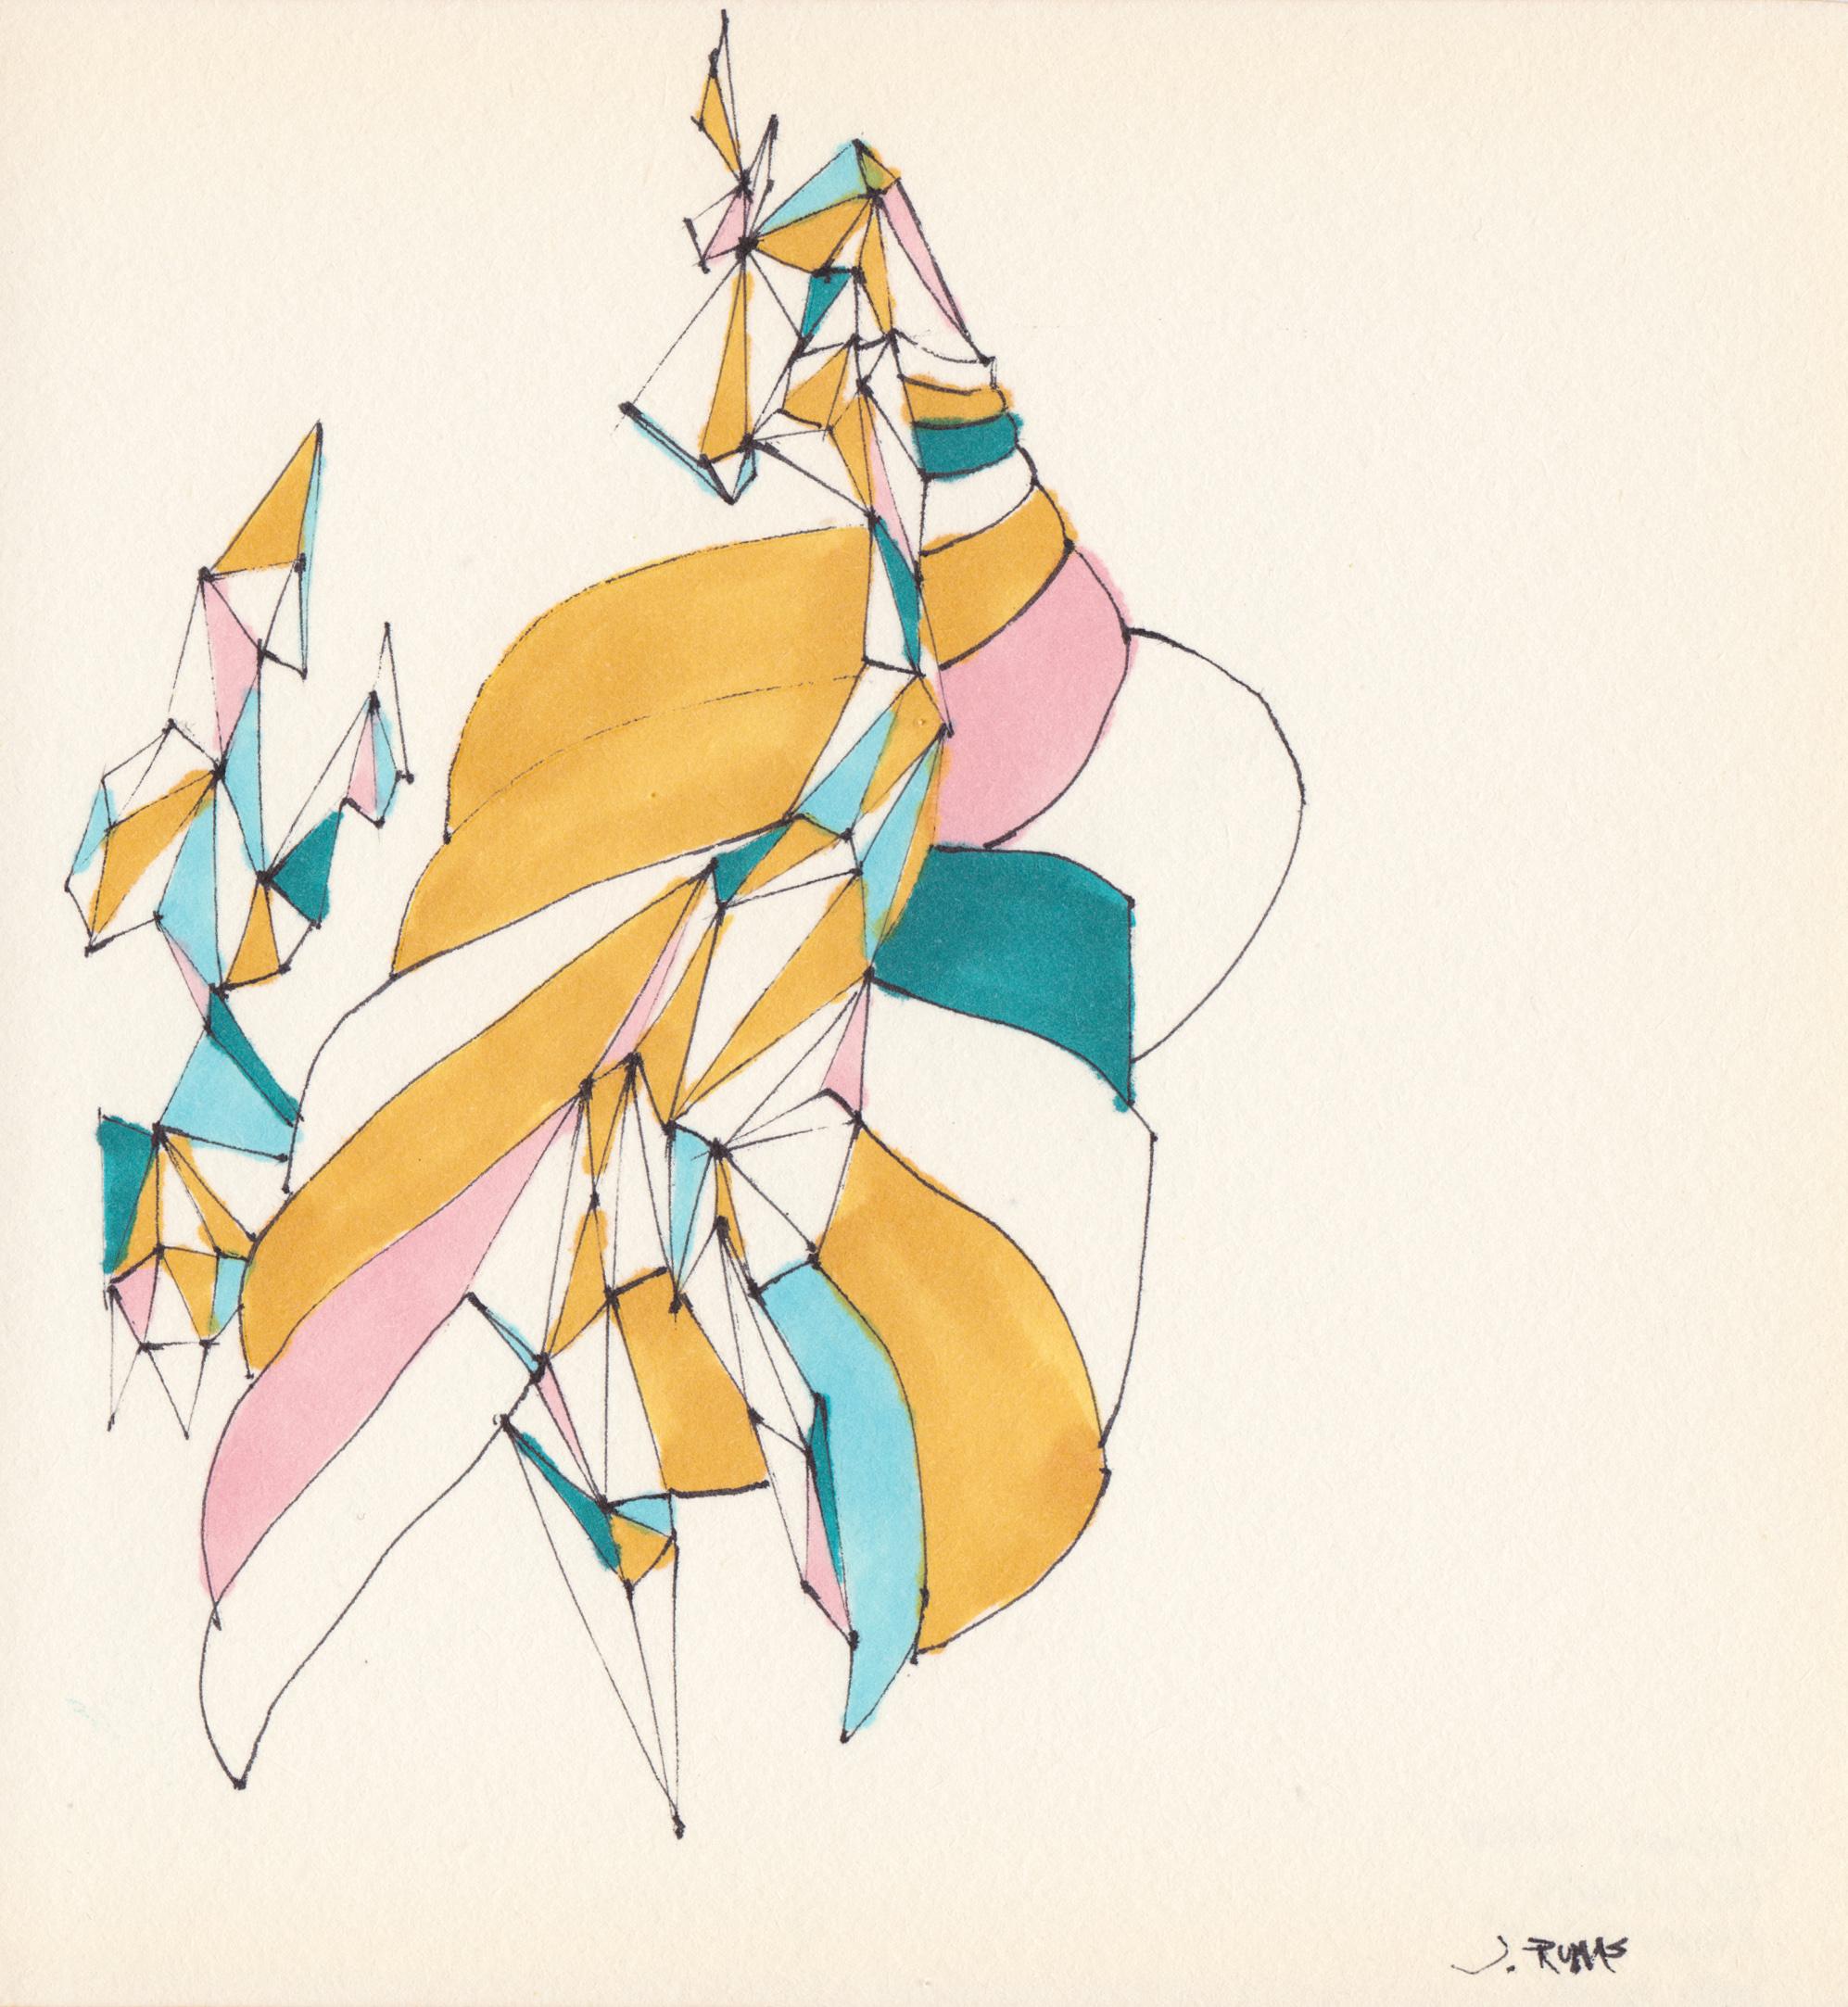 JEREMY RUMAS ART + PEN and MARKER SKETCHES 08 + abstract futurism + modern art +www.jeremyrumas.com.jpeg